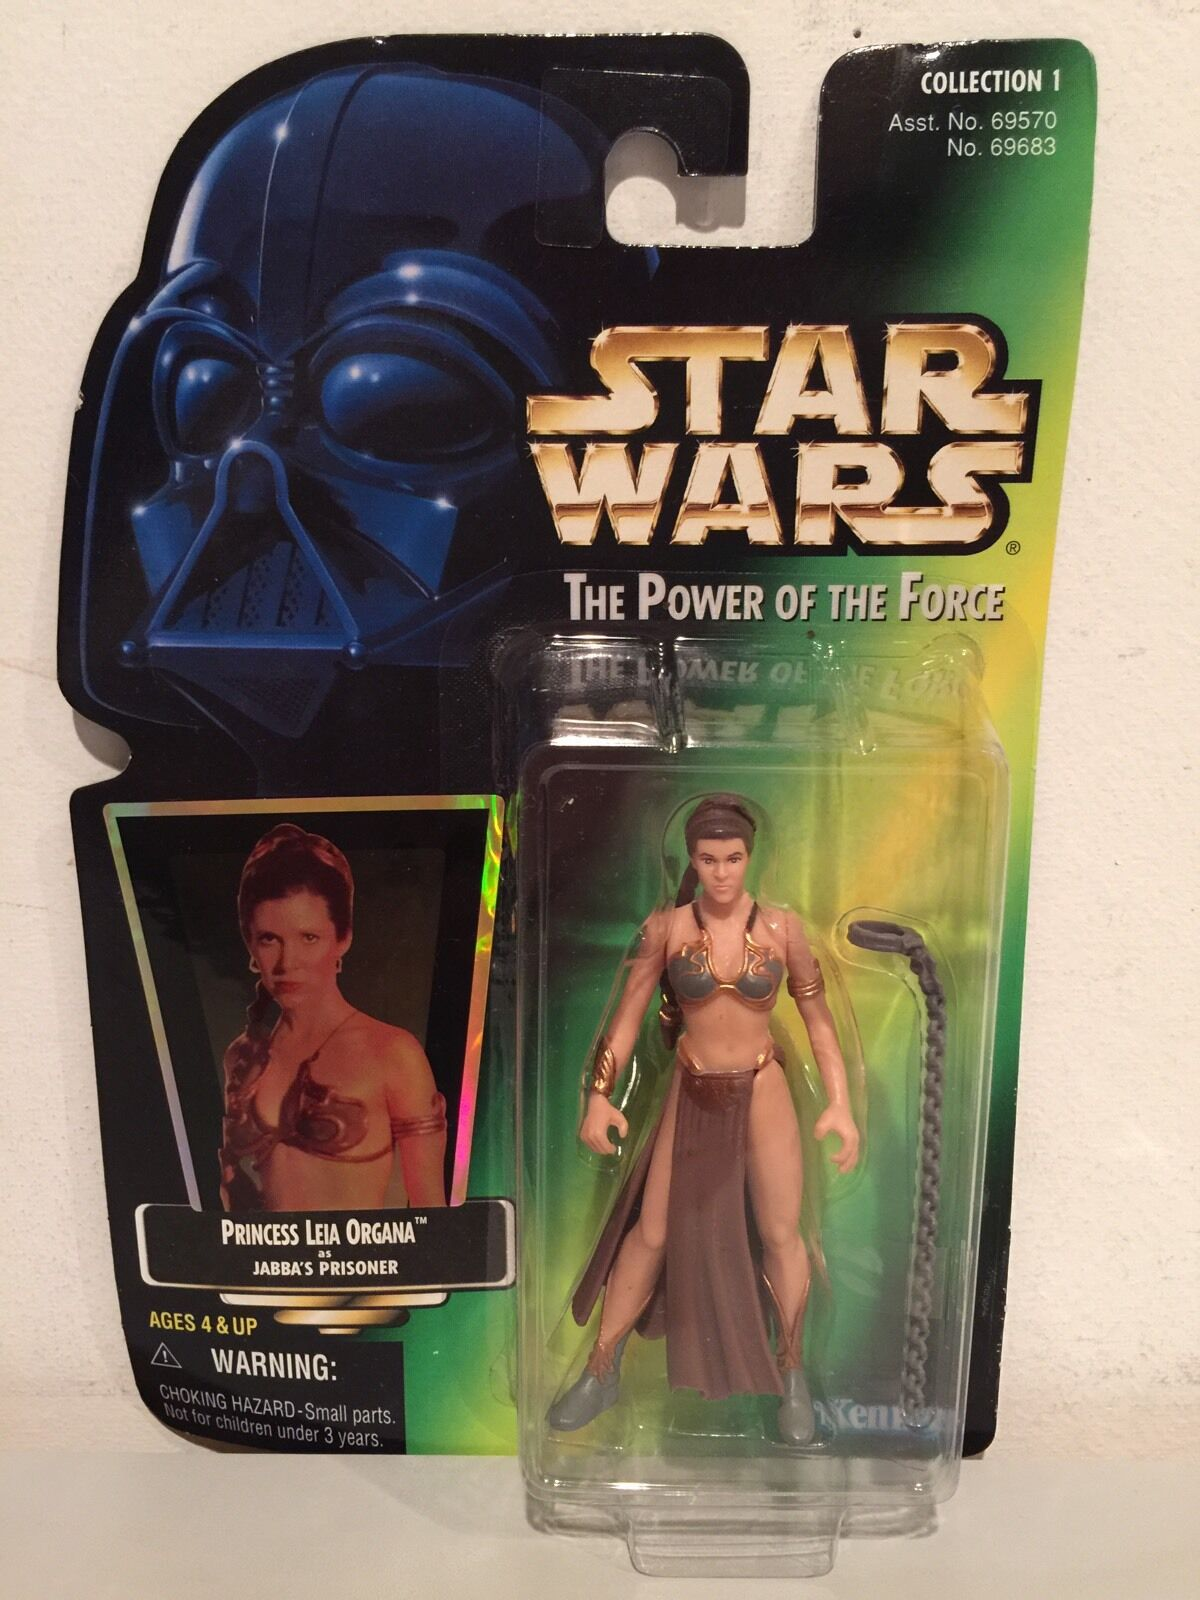 Star Wars Princess Leia Organa as Jabbas Slave POTF Action Figure Kenner